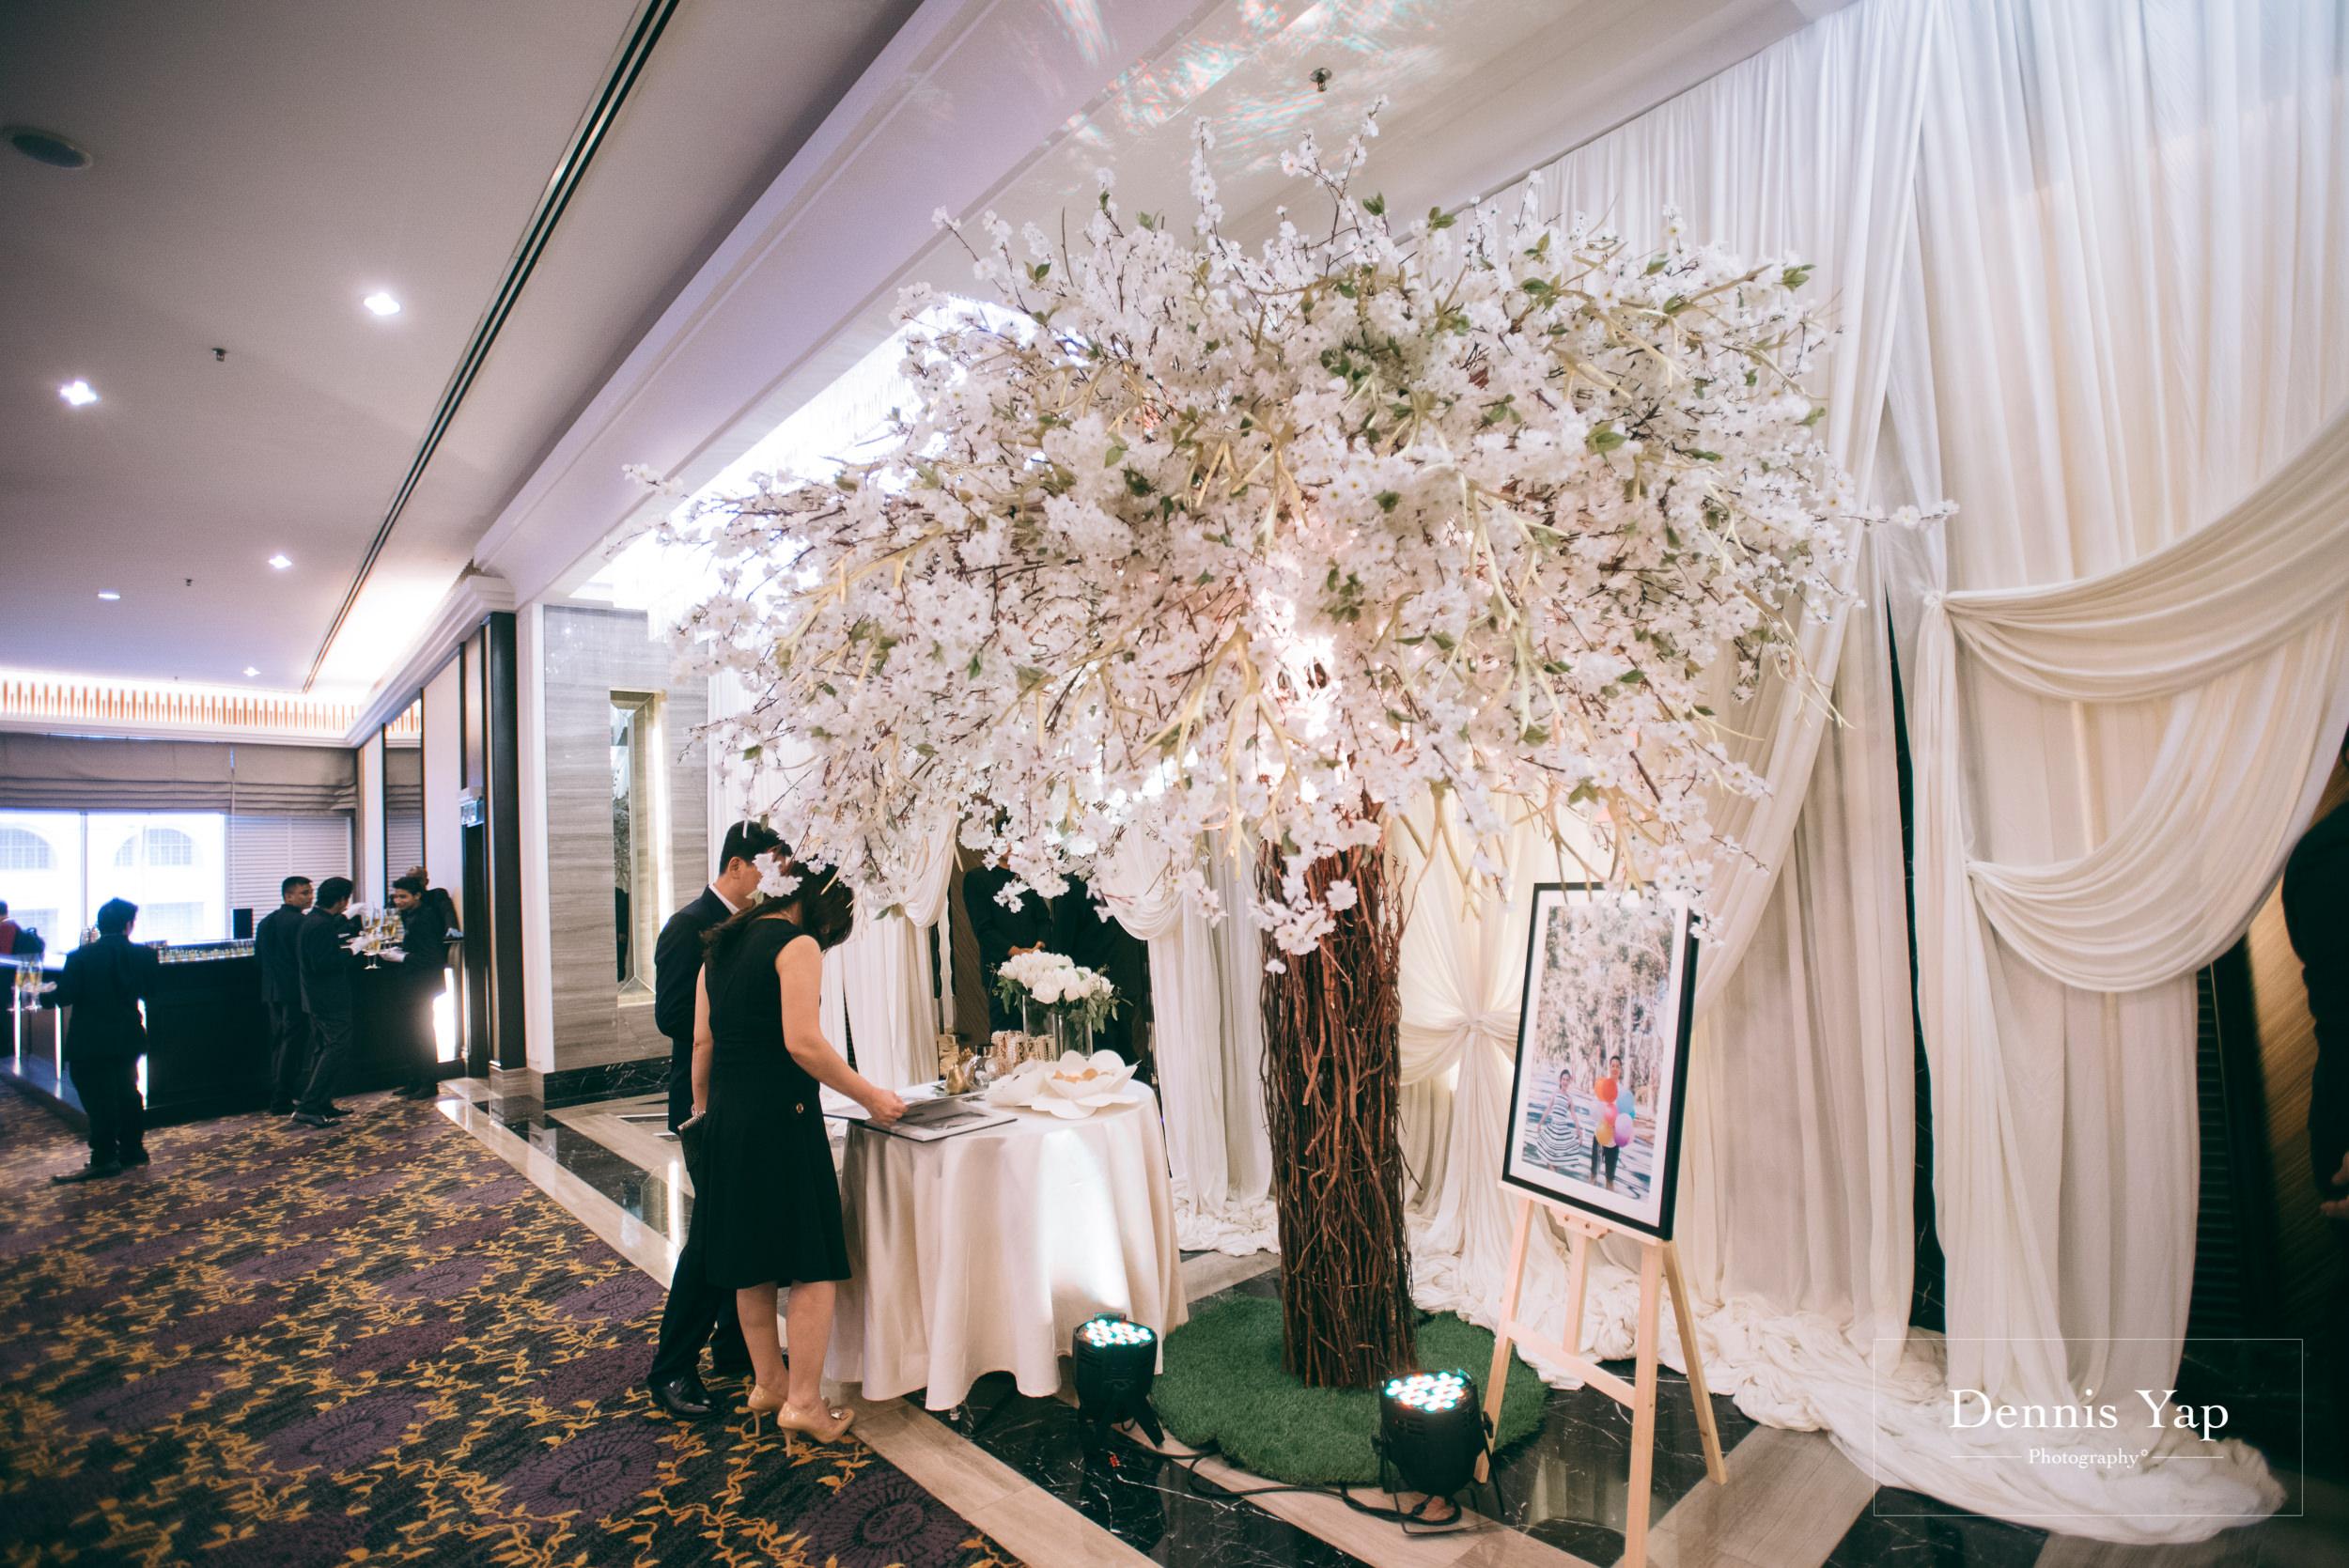 lionel joanne garden wedding majestic hotel dennis yap photography malaysia top wedding photographer-66.jpg